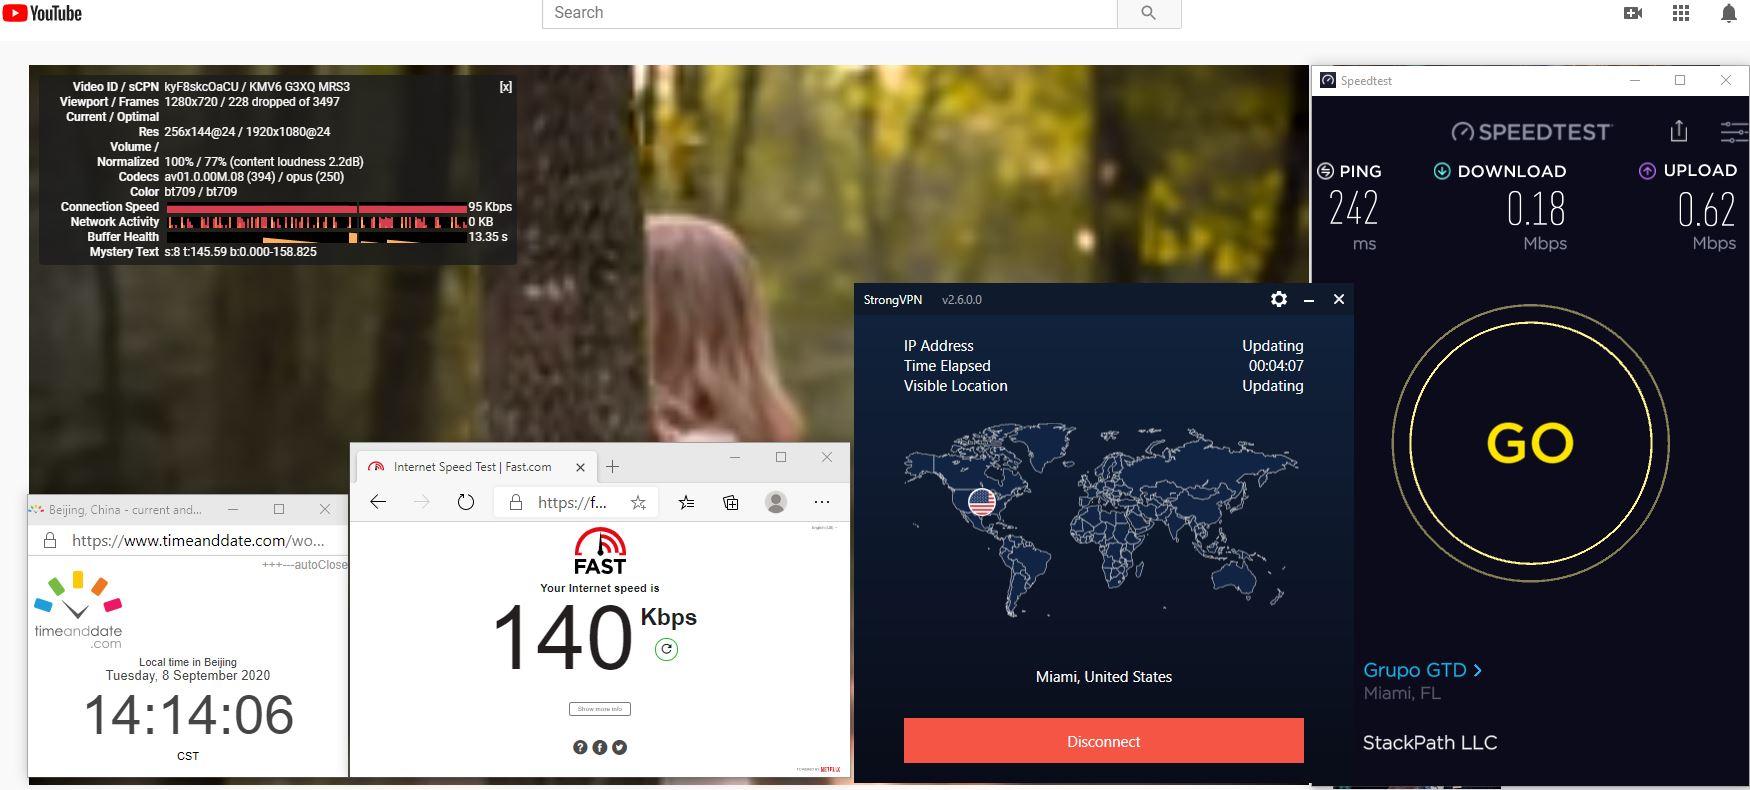 Windows10 StrongVPN USA - Miami 中国VPN 翻墙 科学上网 翻墙速度测试 - 20200908